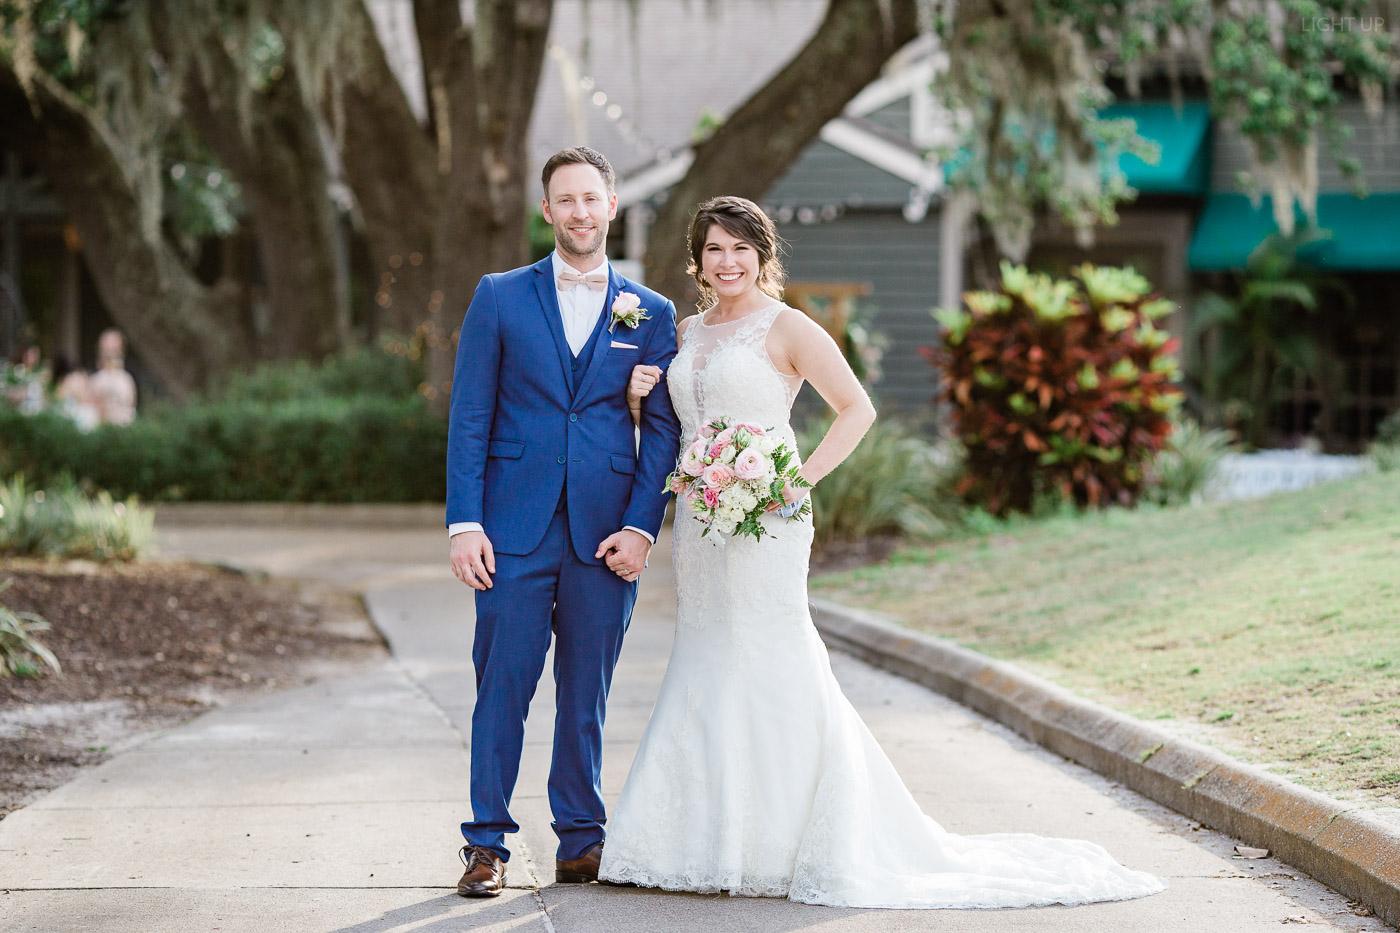 hstoric-dubsdread-wedding-orlando-26.jpg